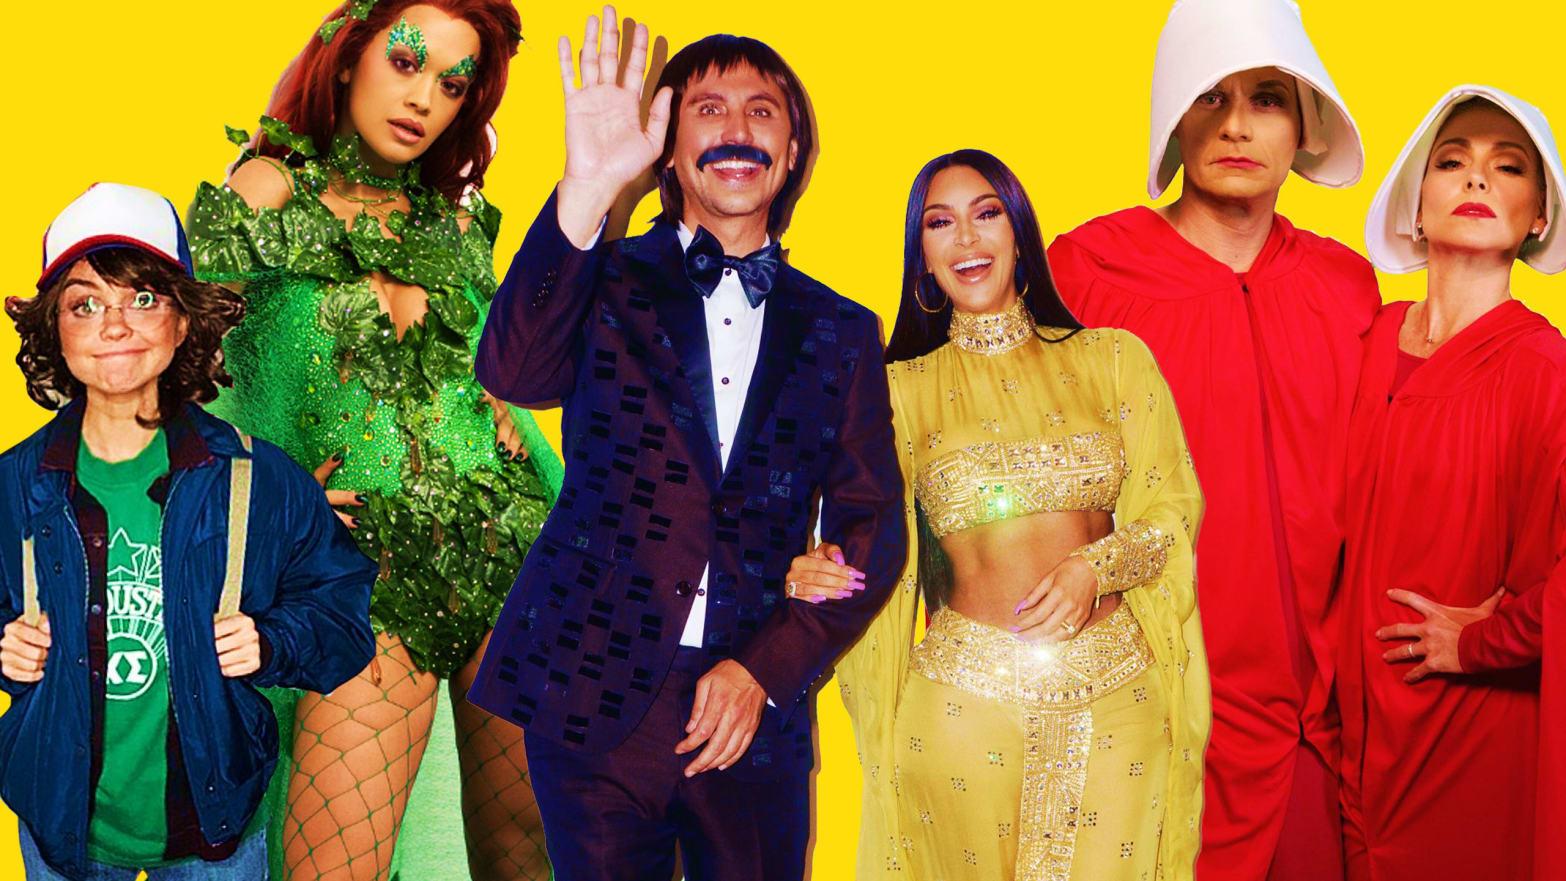 The Best Celebrity Halloween Costumes Of 2017